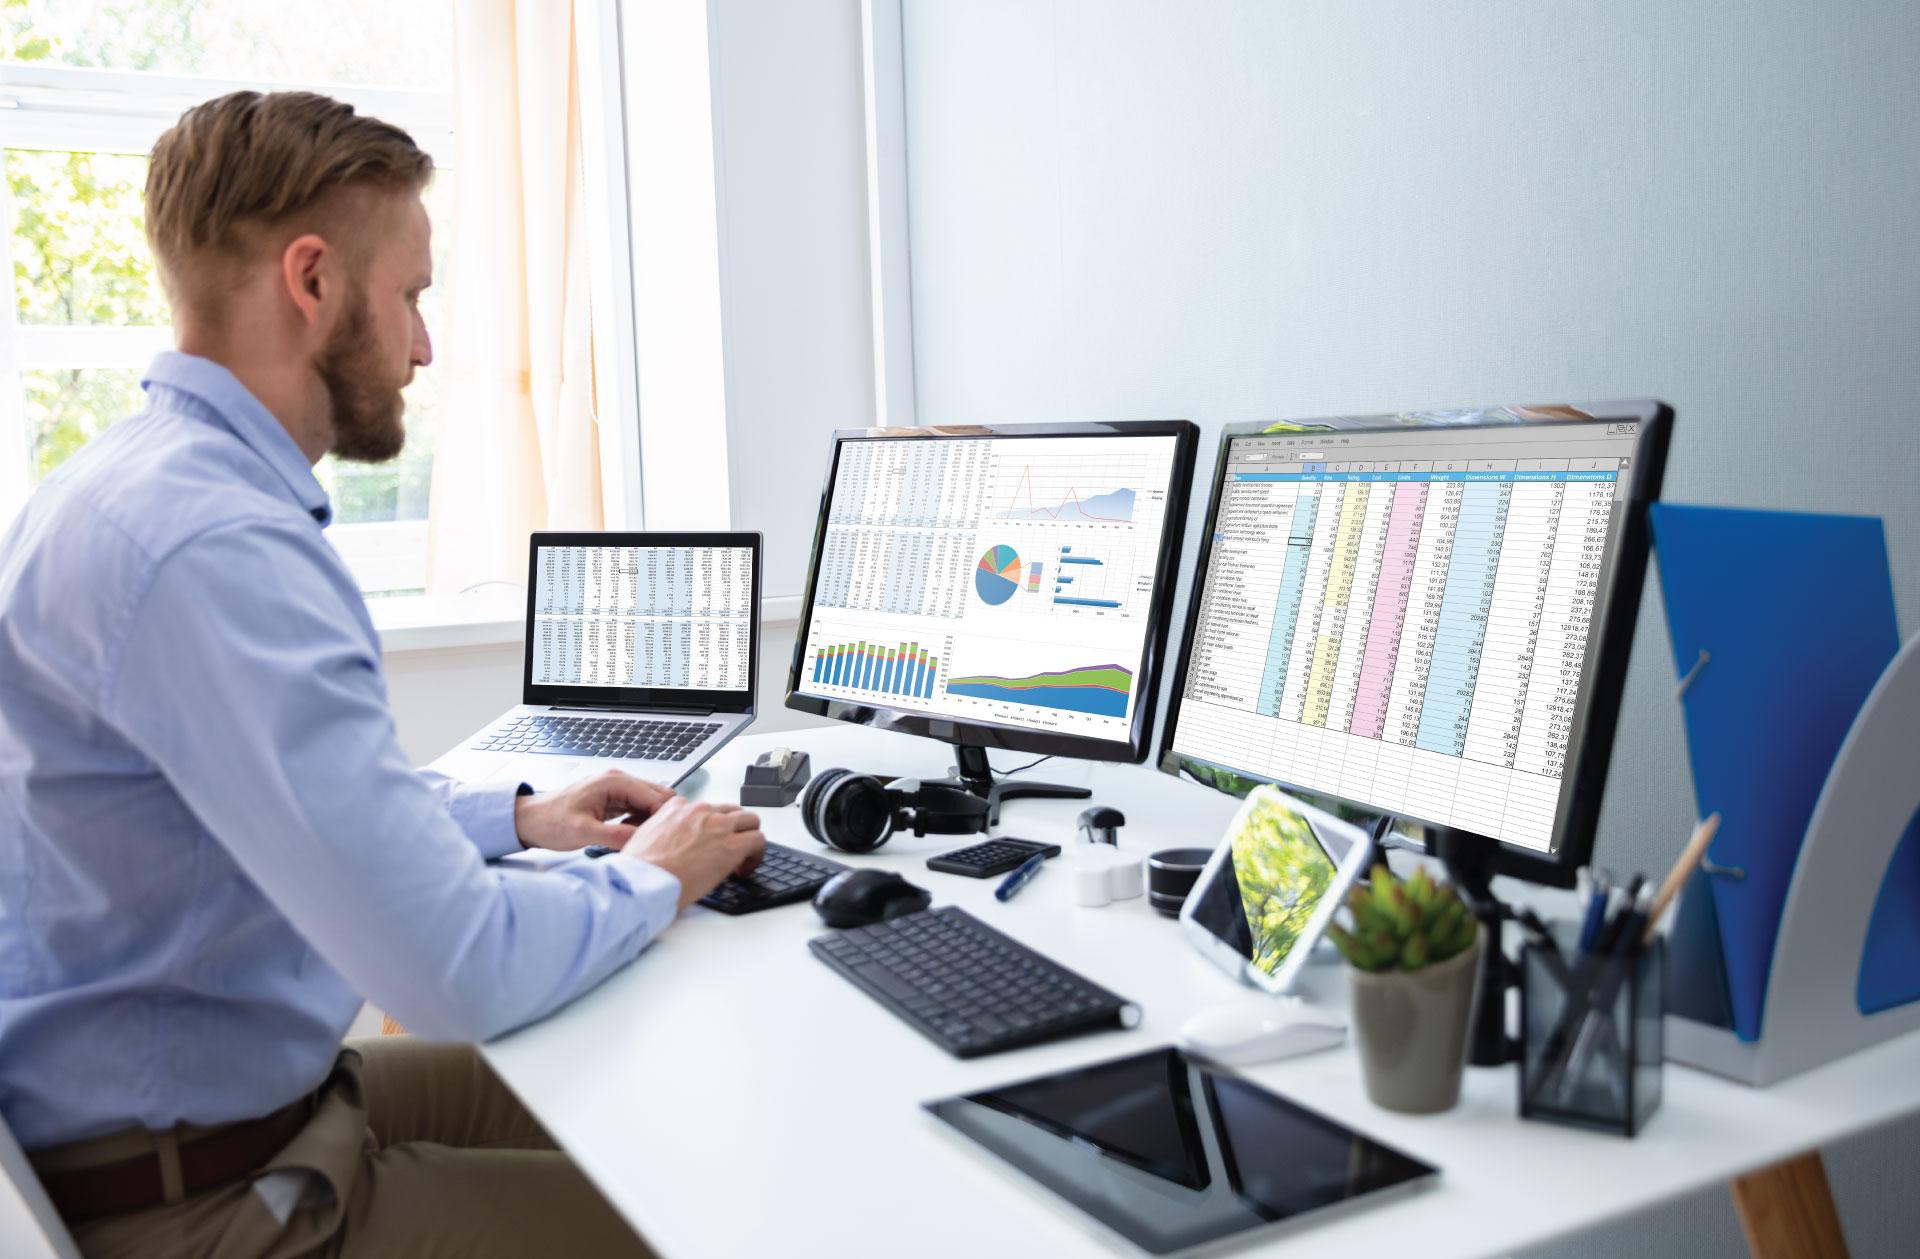 marketing-operations-single-source-of-data